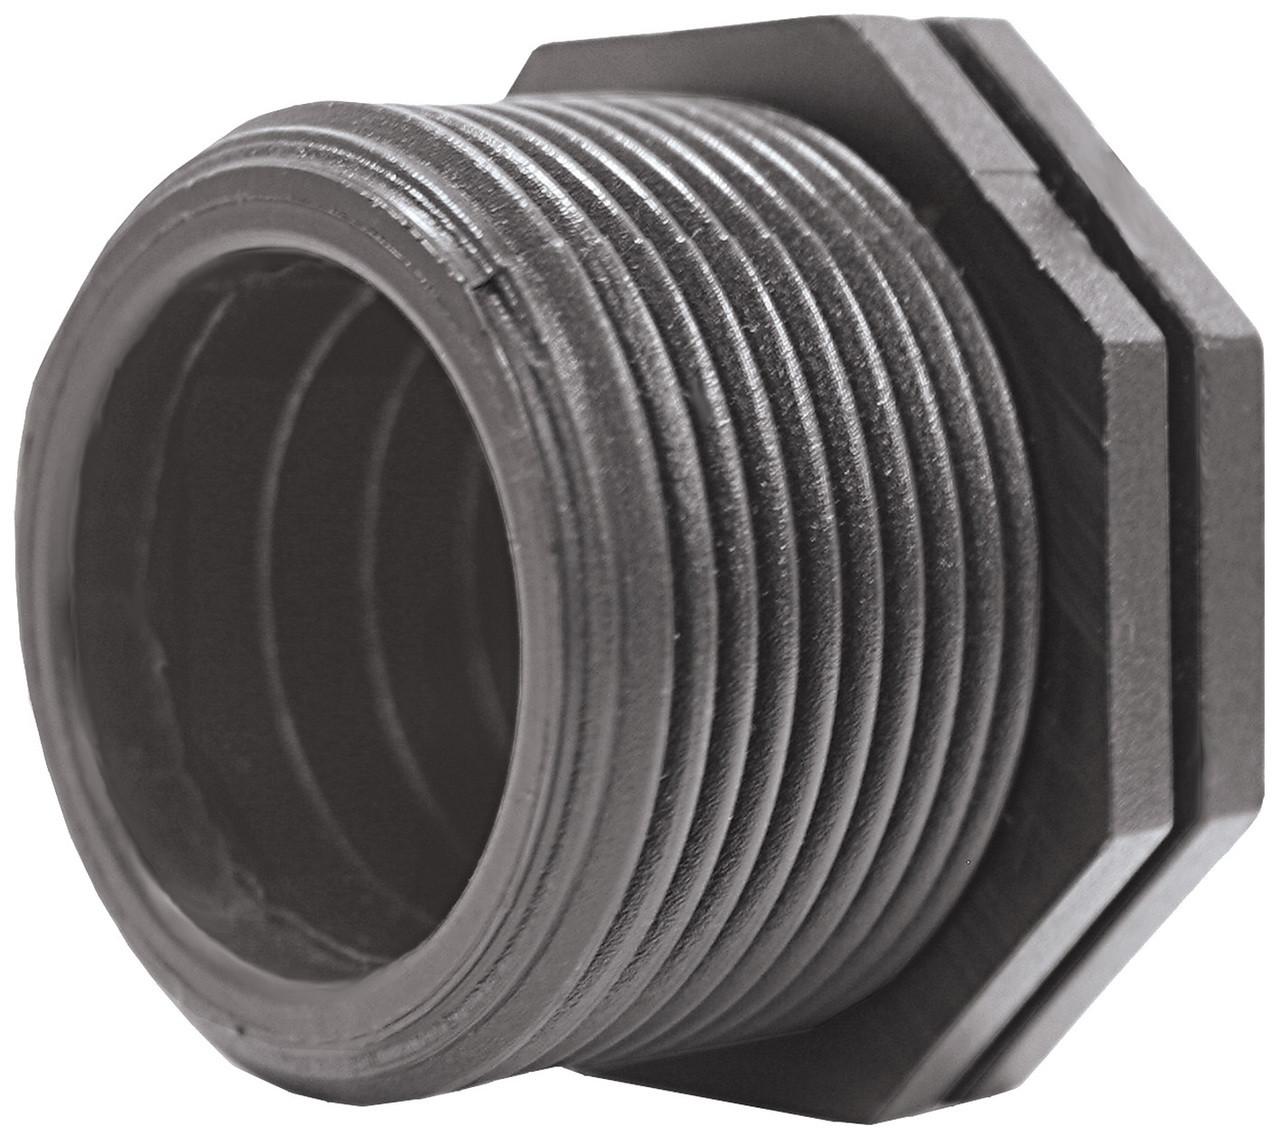 Threaded Plug M BSP 1 1/2